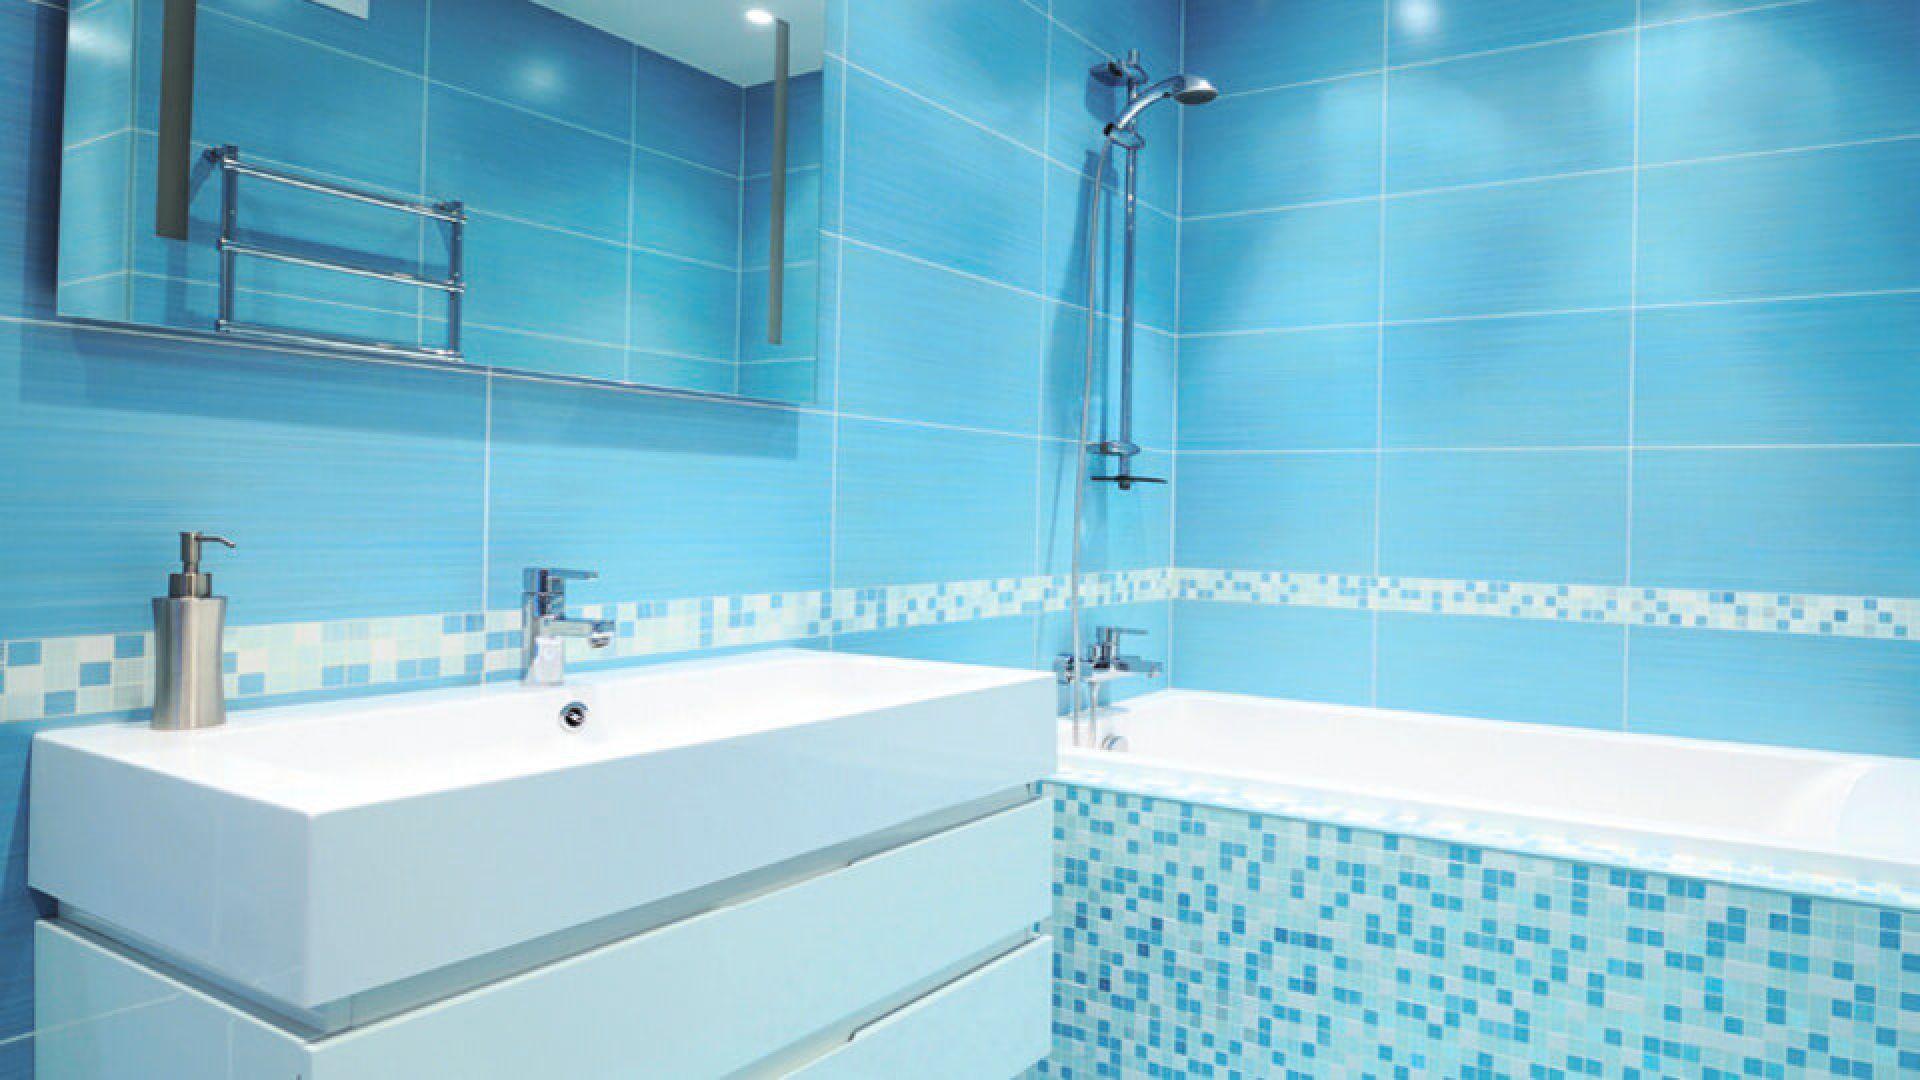 simulateur carrelage salle de bain simulation salle de bain salle de bain d on decoration d. Black Bedroom Furniture Sets. Home Design Ideas